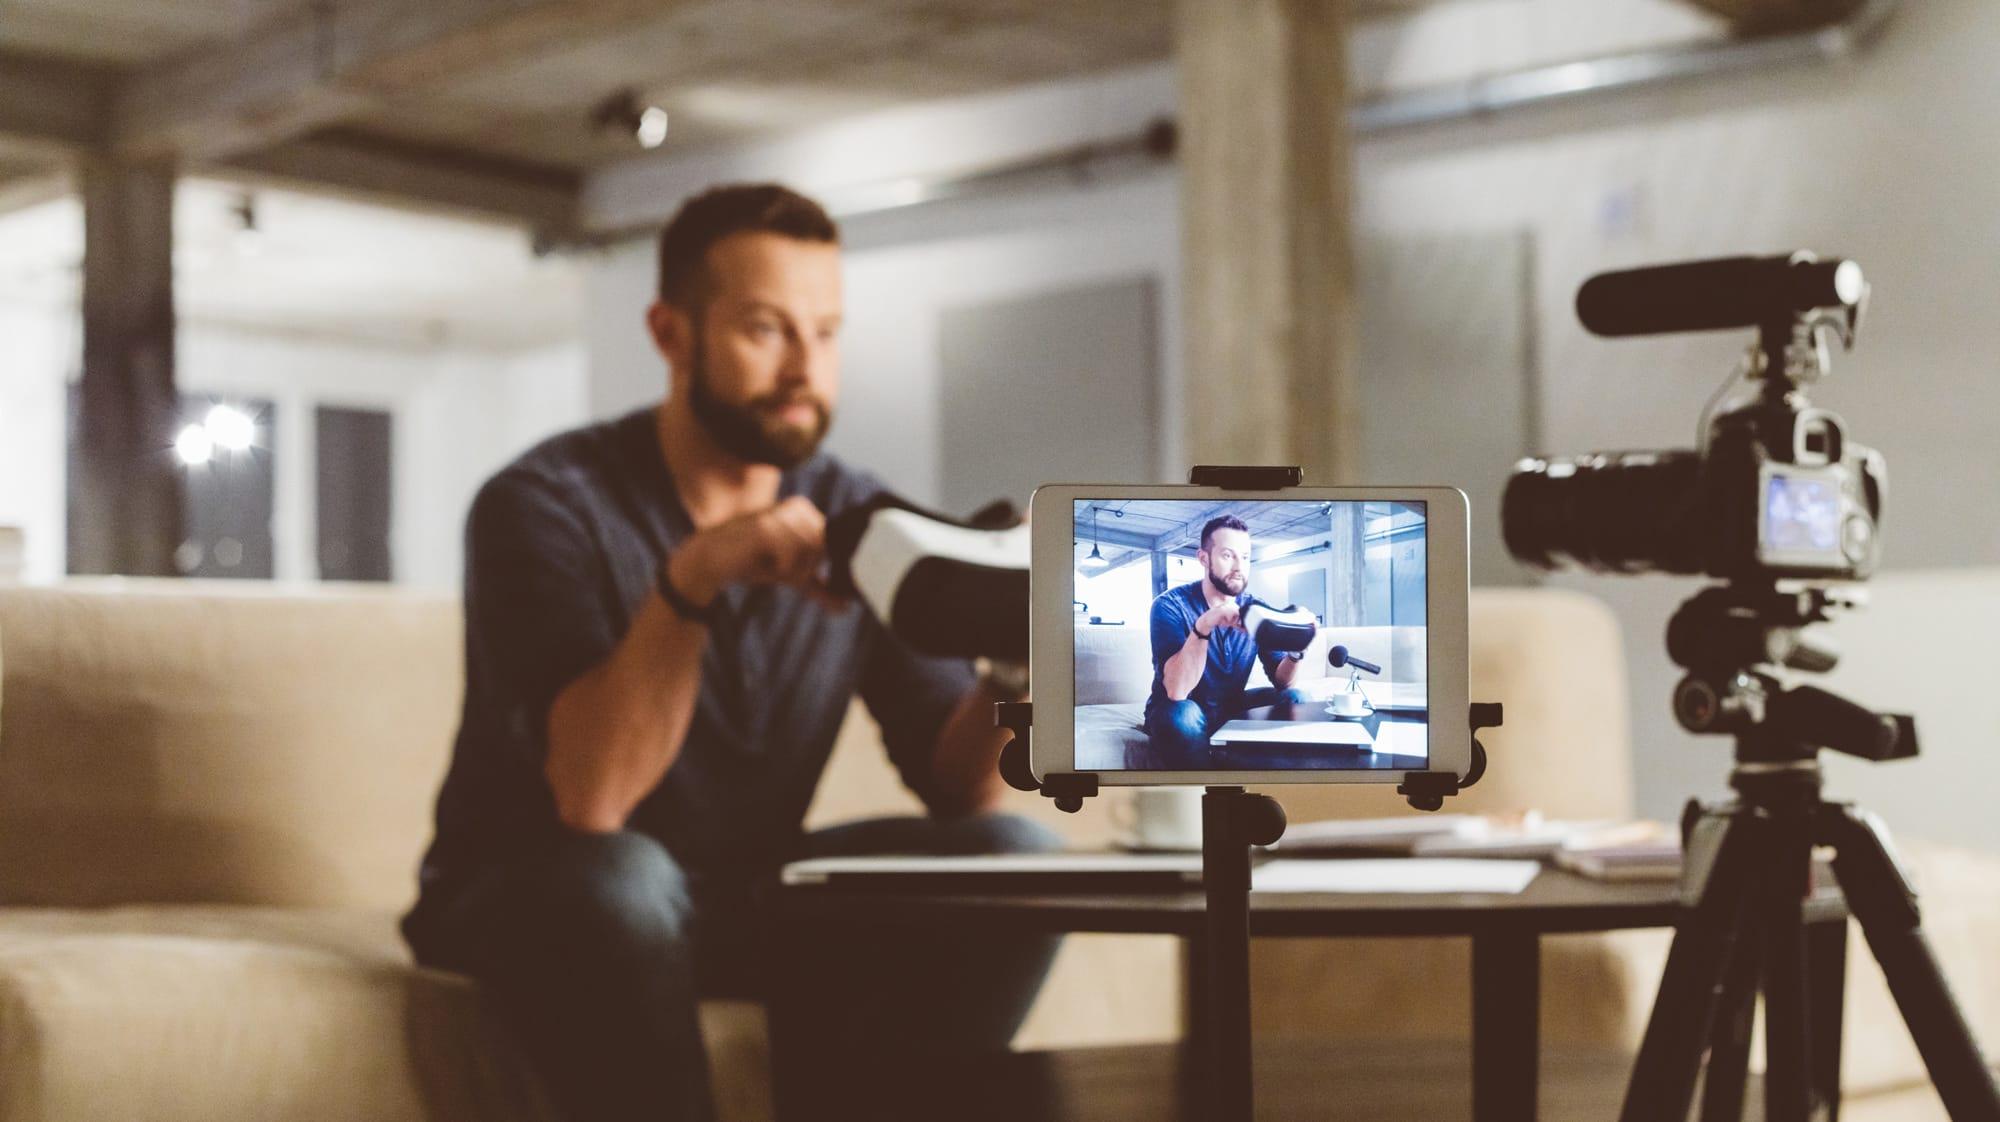 Importância do Vídeo no Marketing Digital